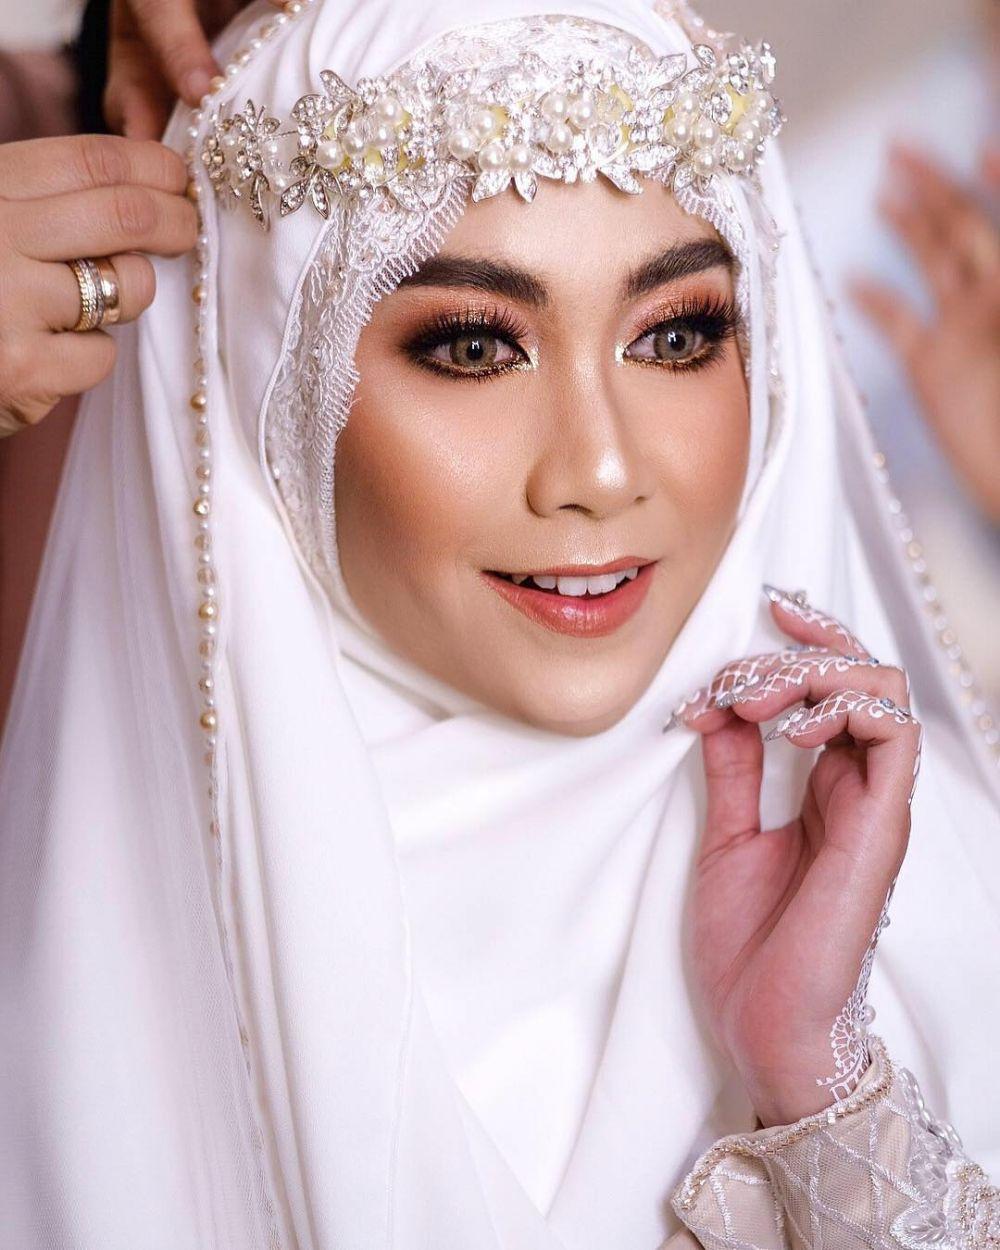 10 Inspirasi gaun pengantin seleb berhijab, tradisional sampai mod